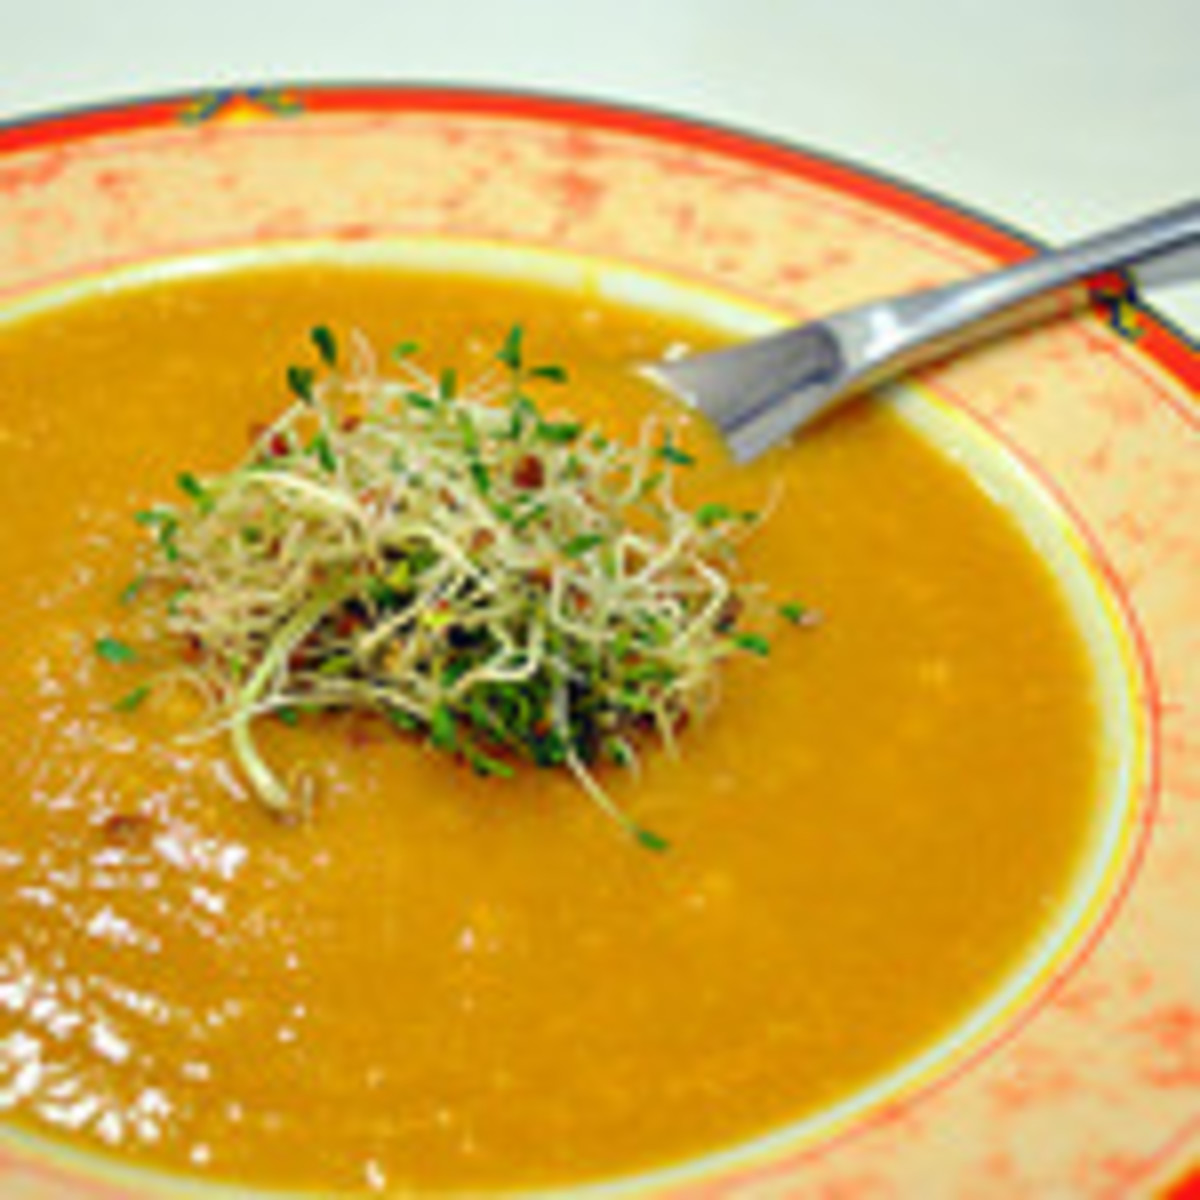 alfalfa-natural-herb-remedy